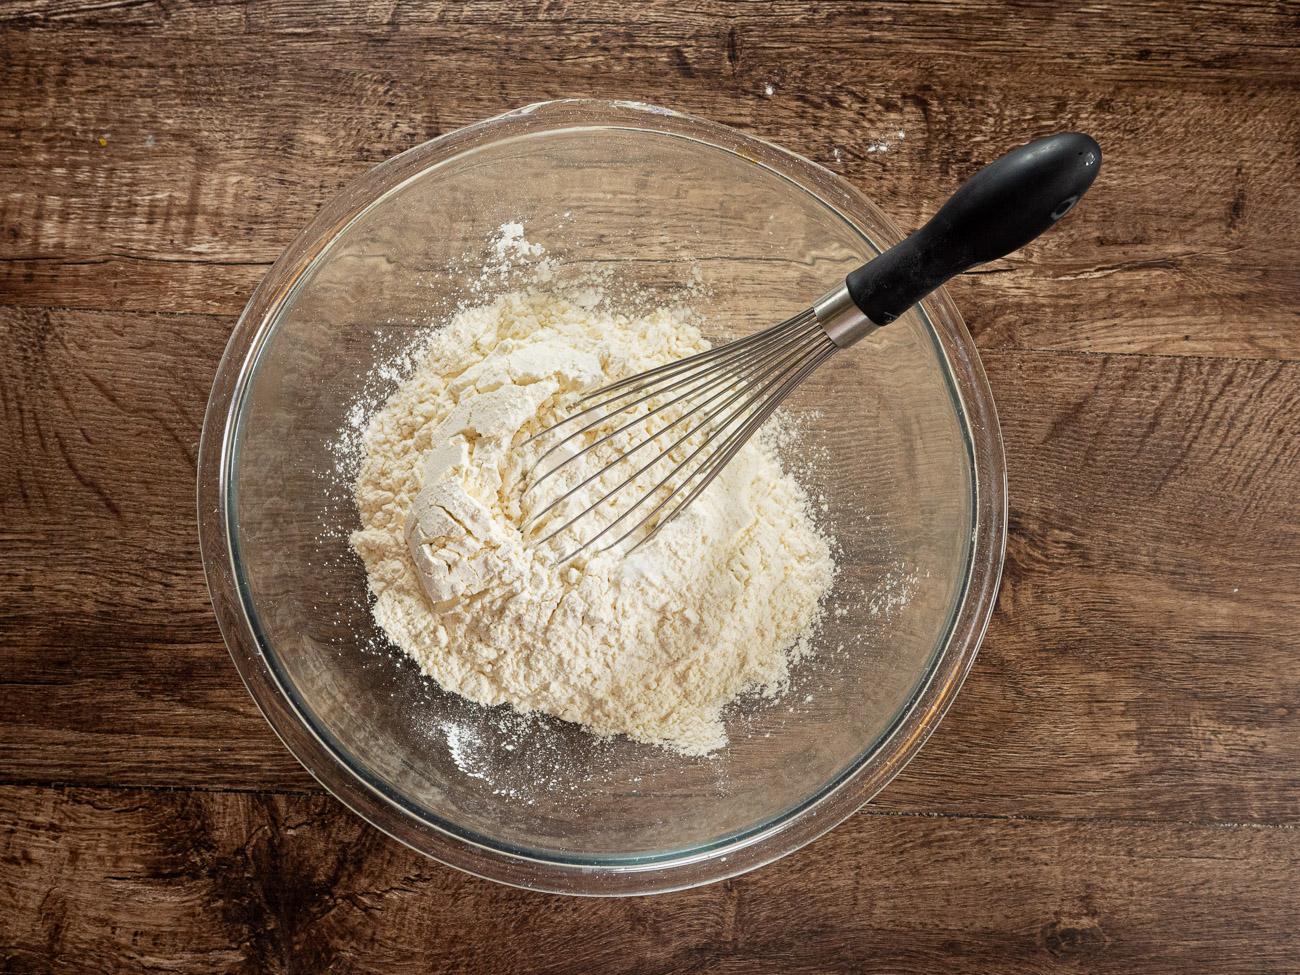 In a medium bowl whisk together flour, baking powder, and salt.